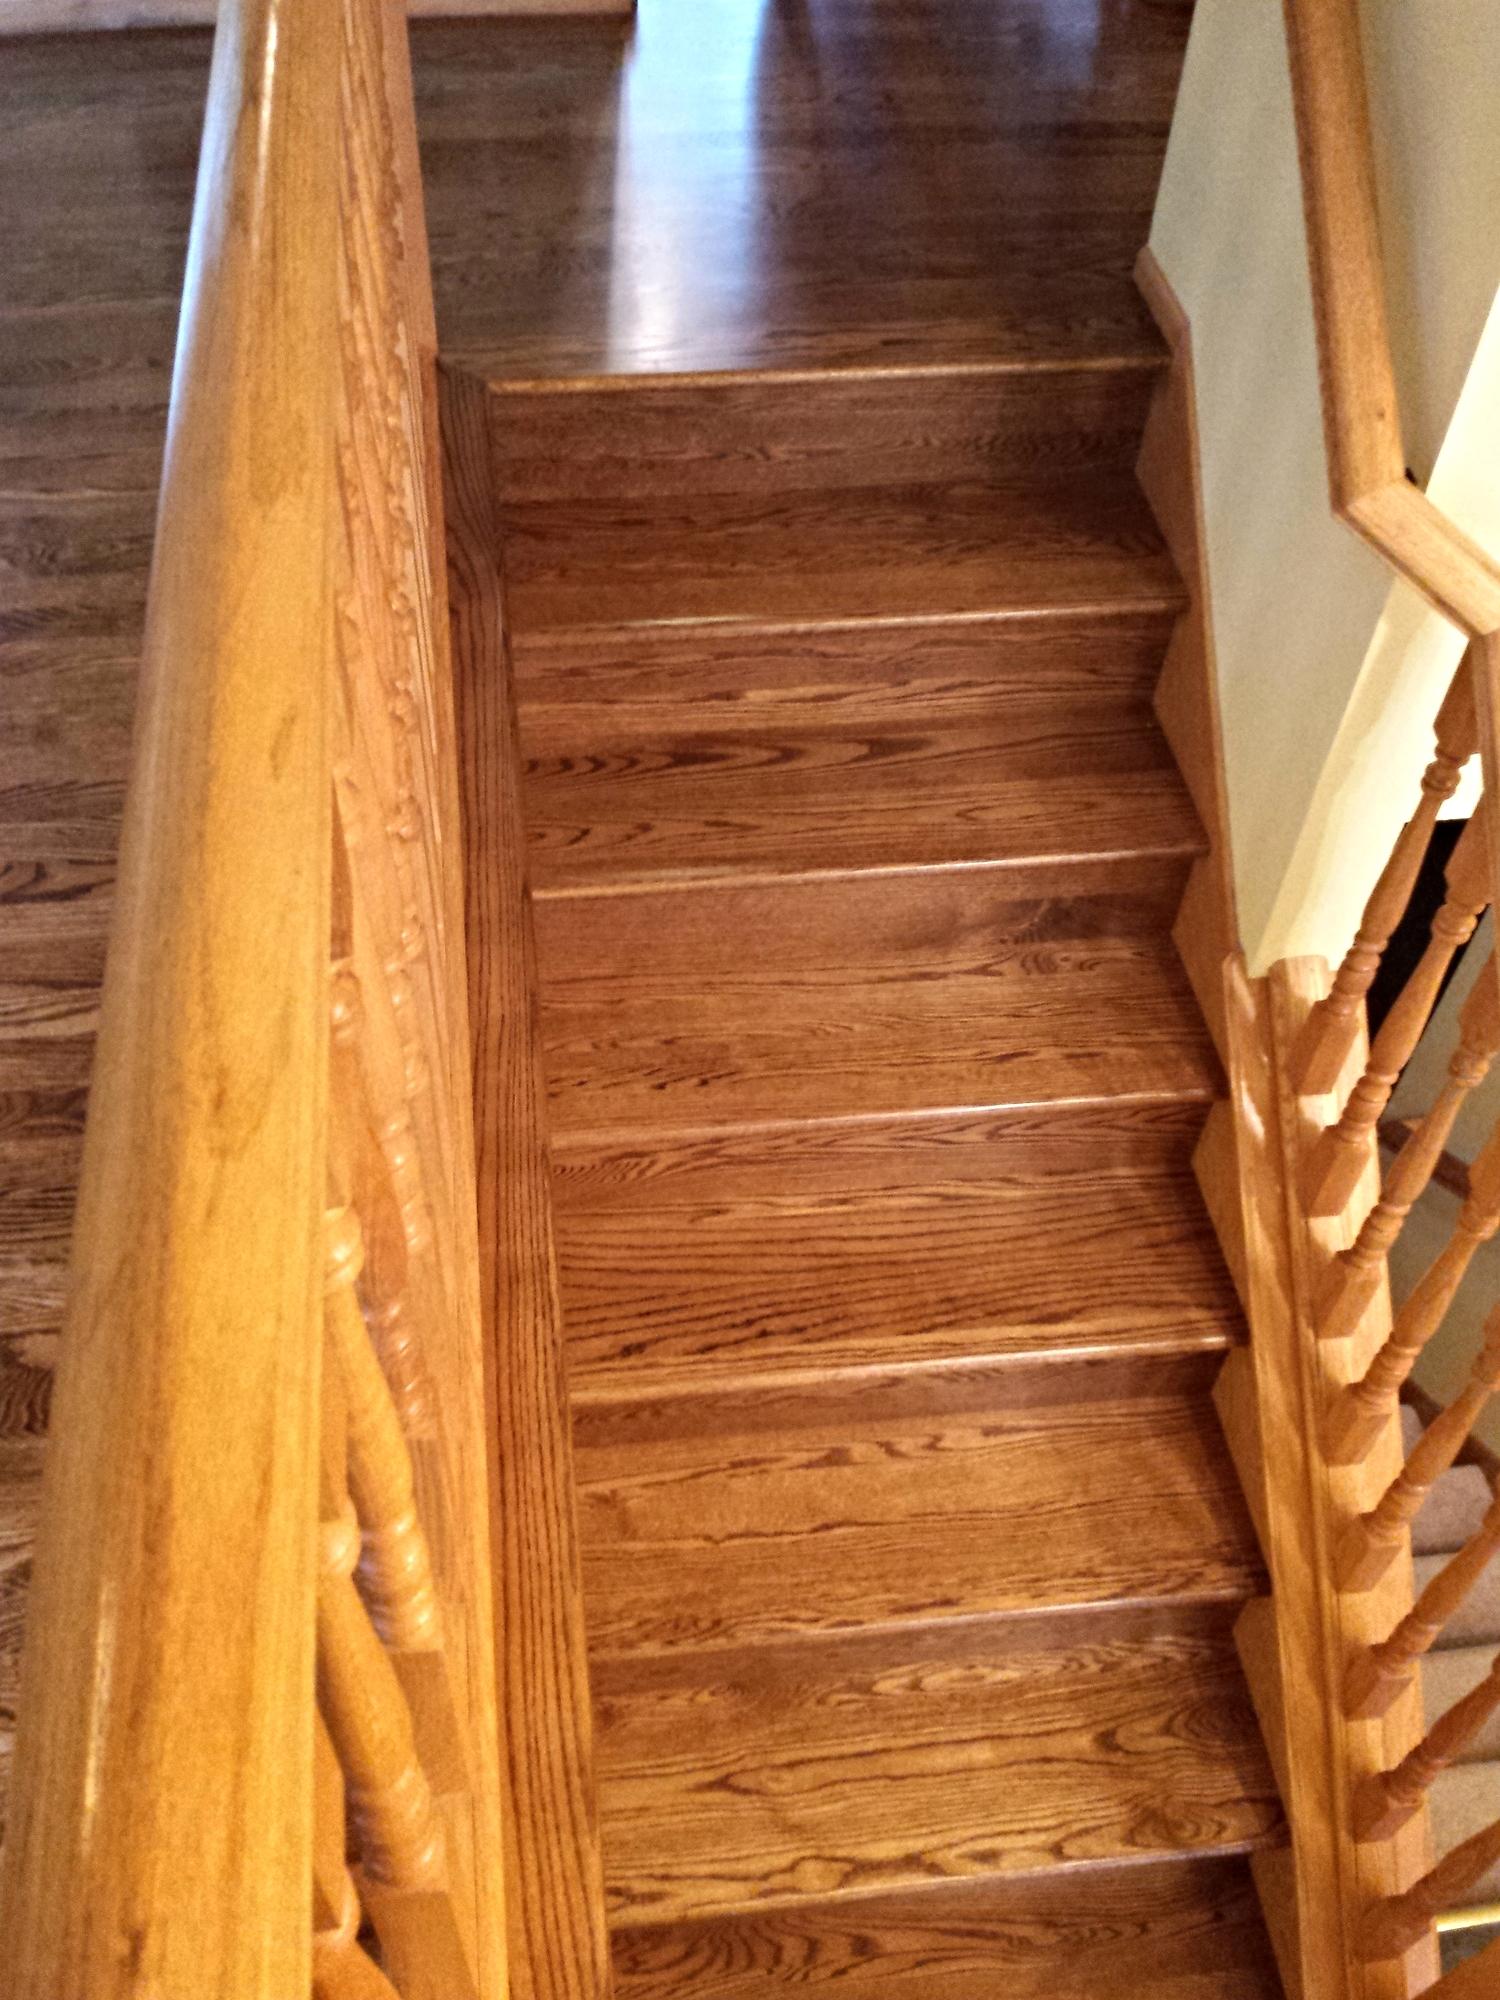 Red oak staircase in Stillwater, MN